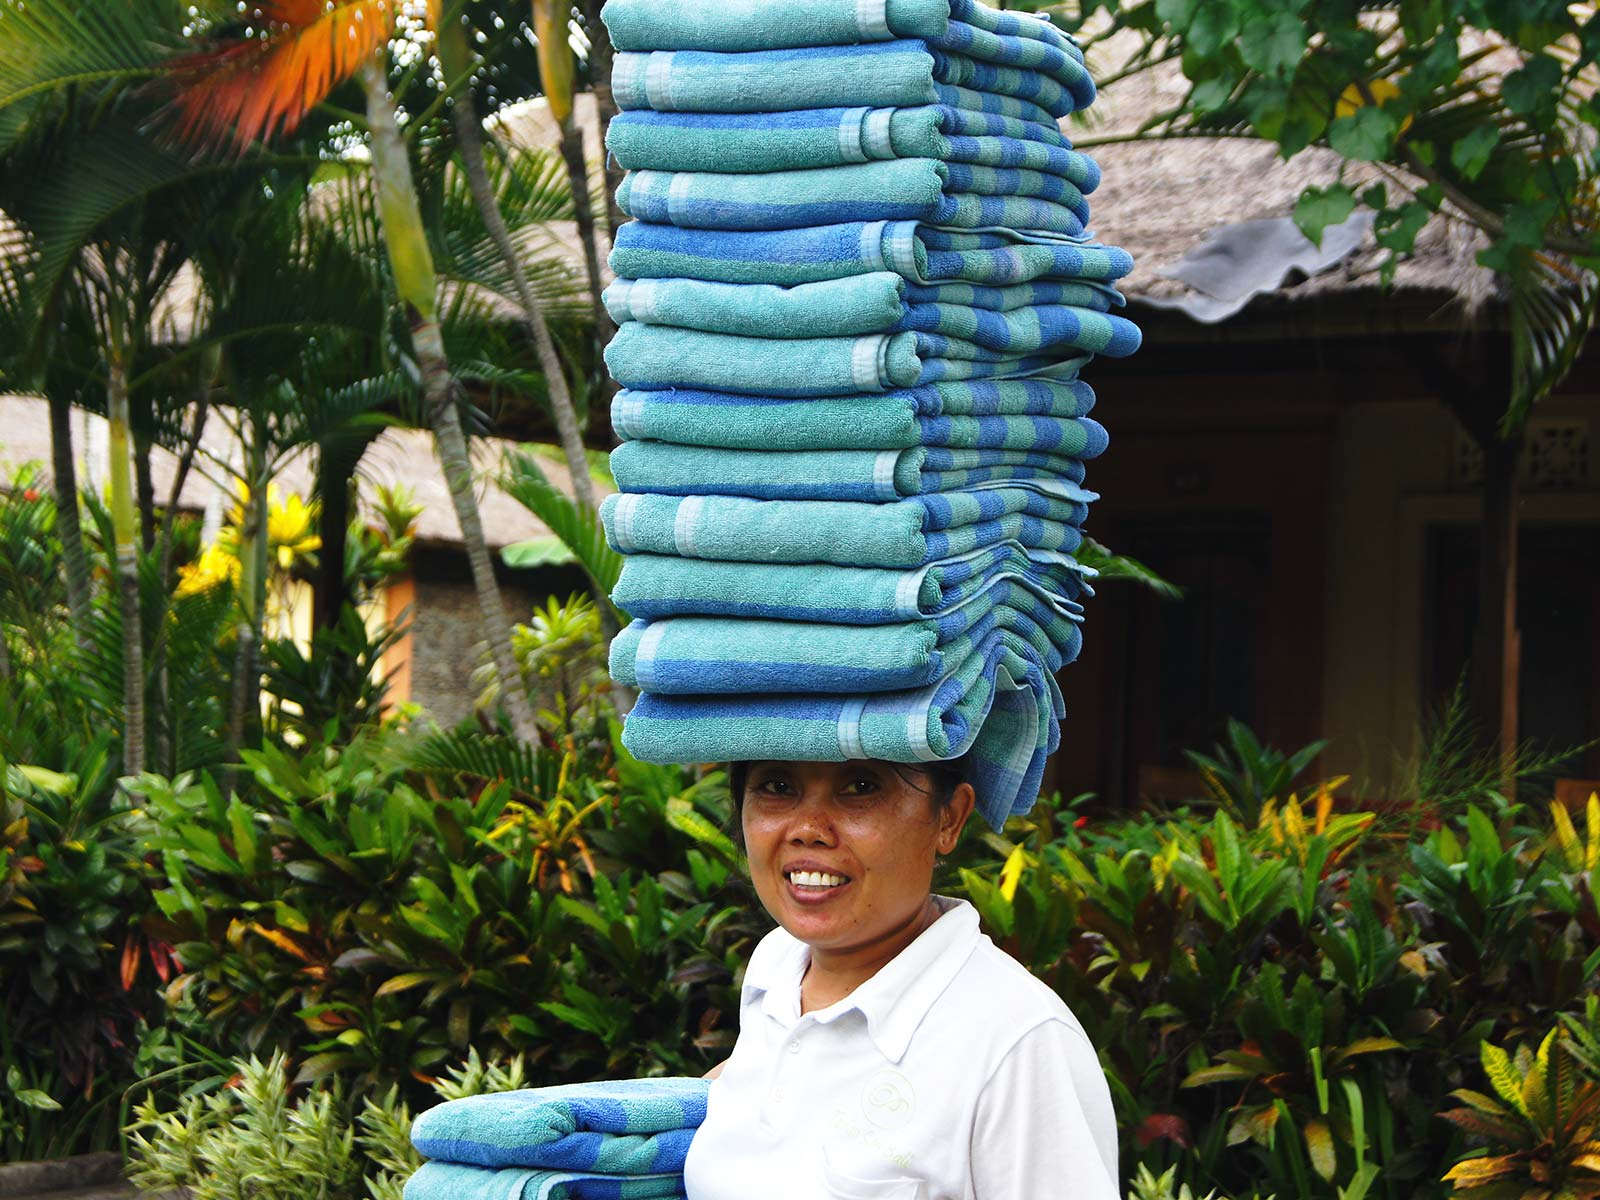 tips duurzaam toerisme handdoeken hotel in pemuteran bali